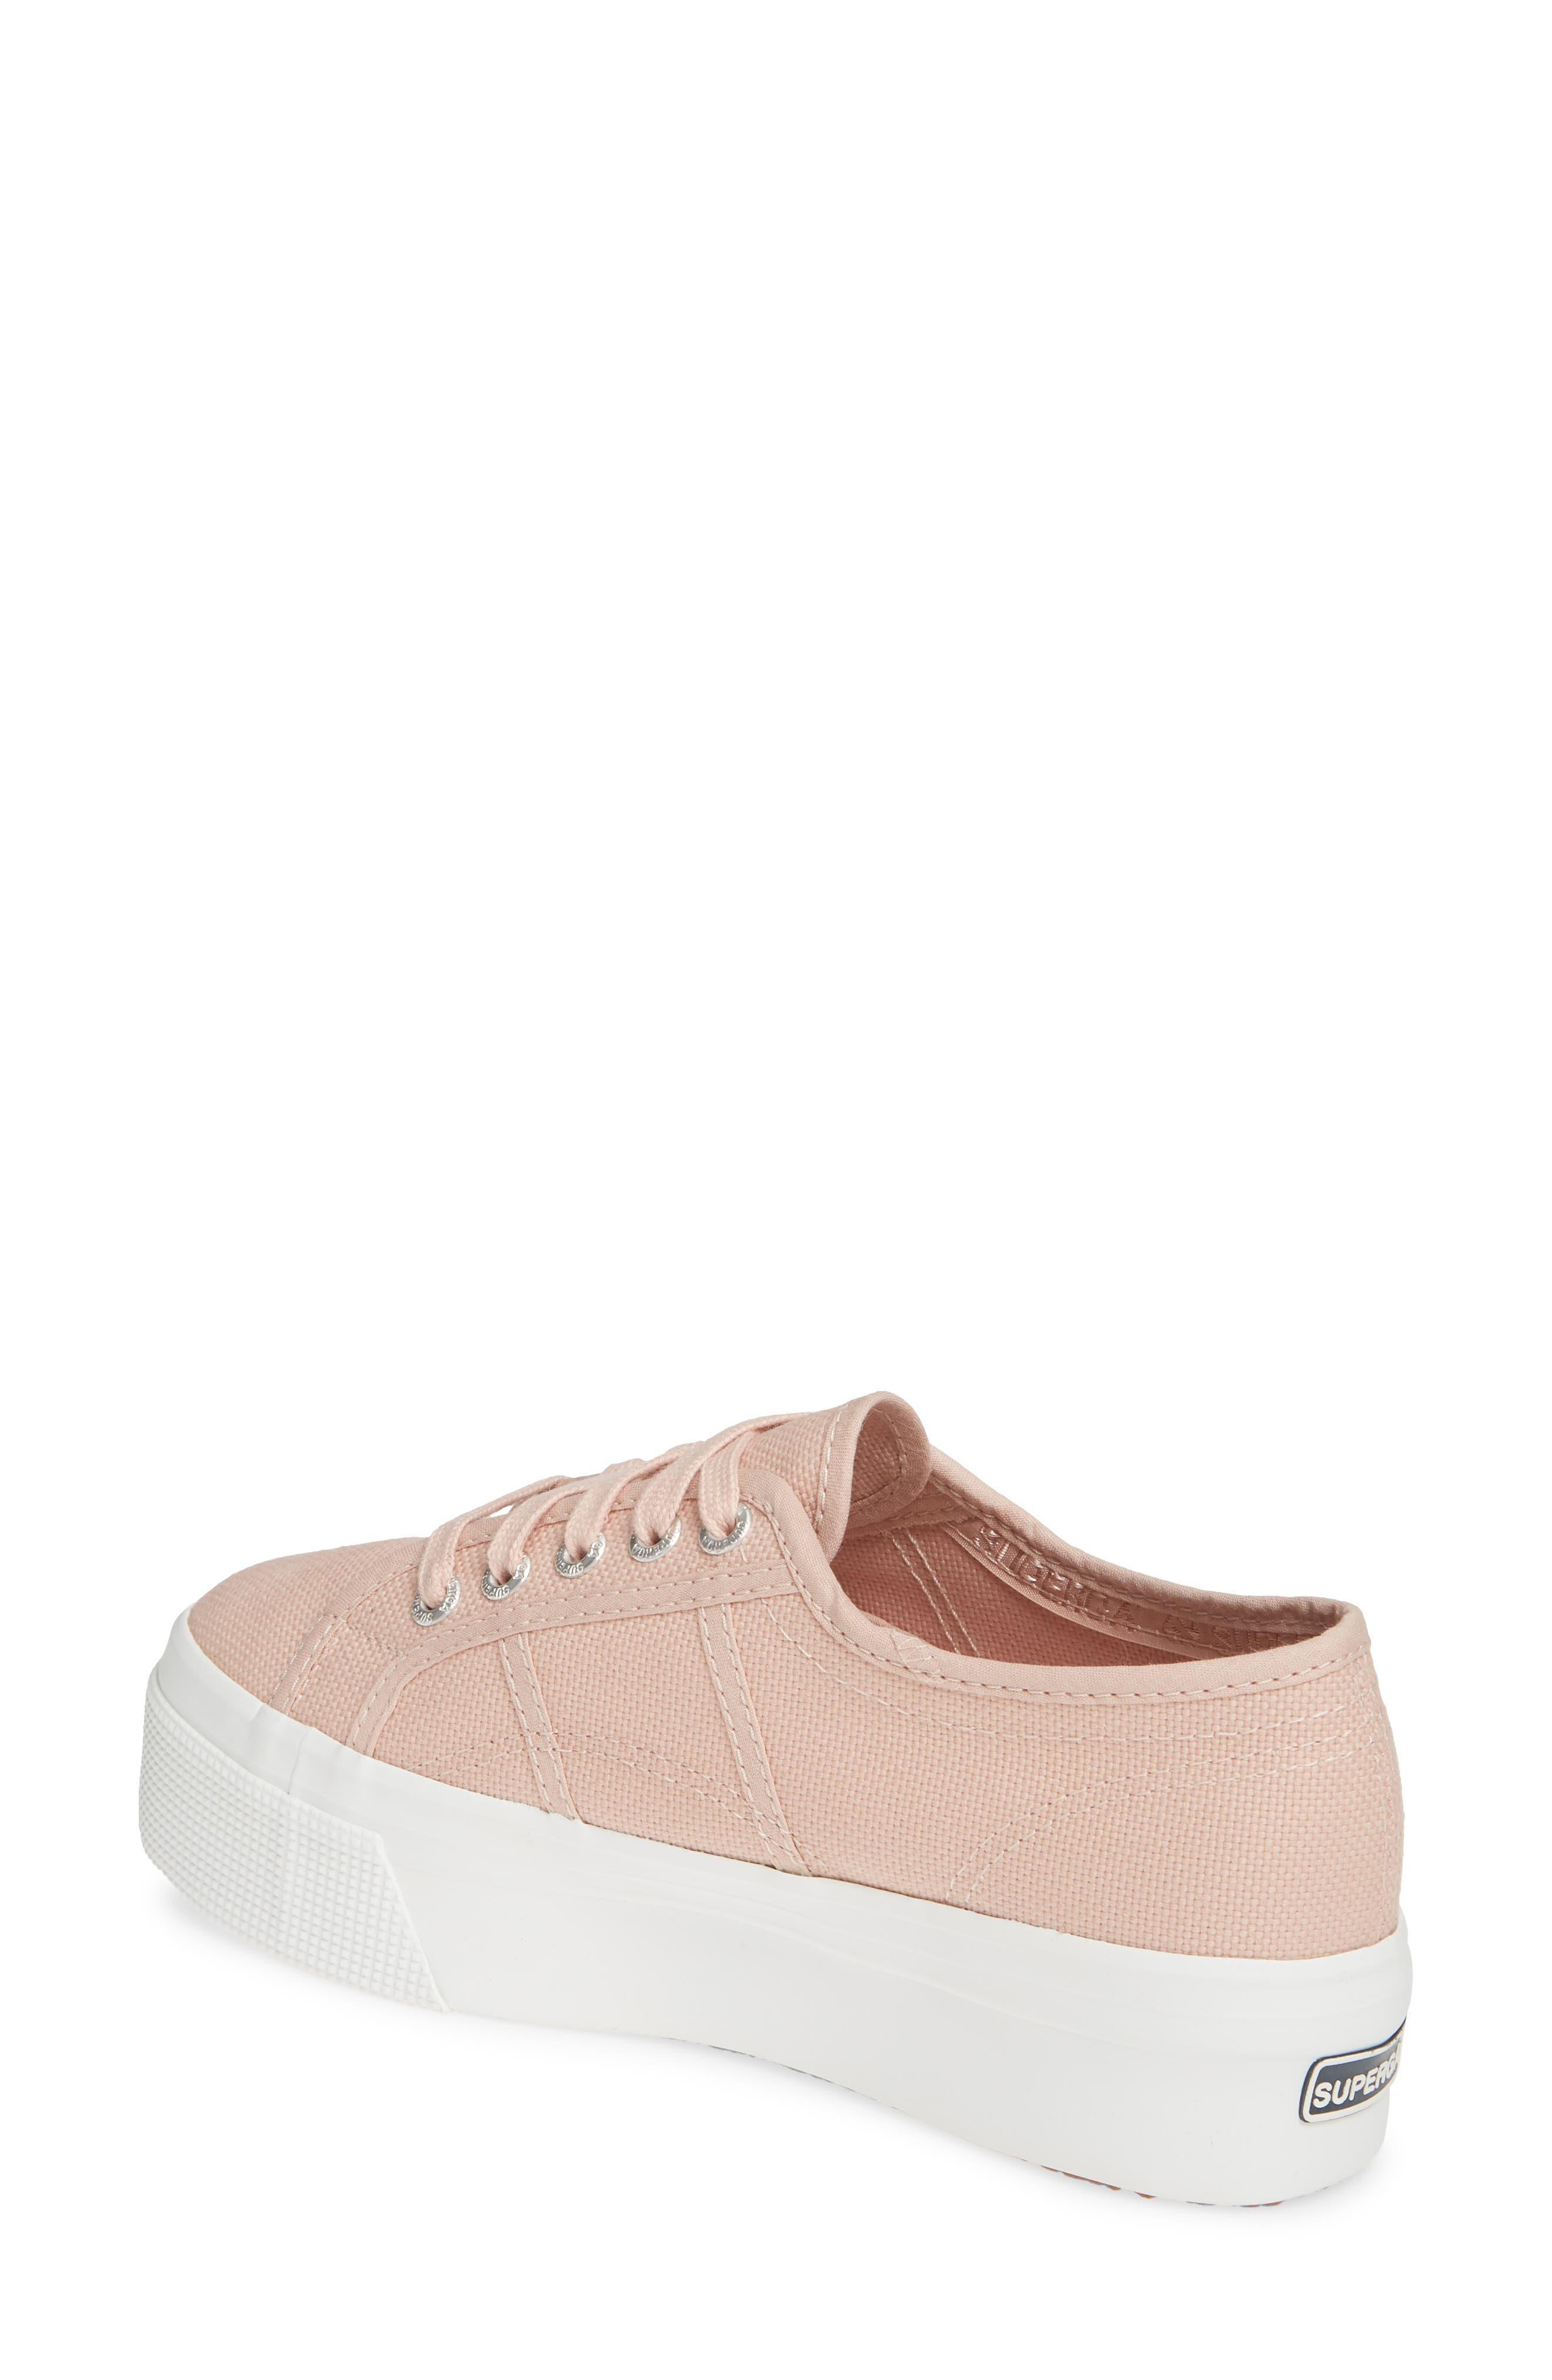 37174b2ca8 Women's Platform Casual Sneakers | Nordstrom